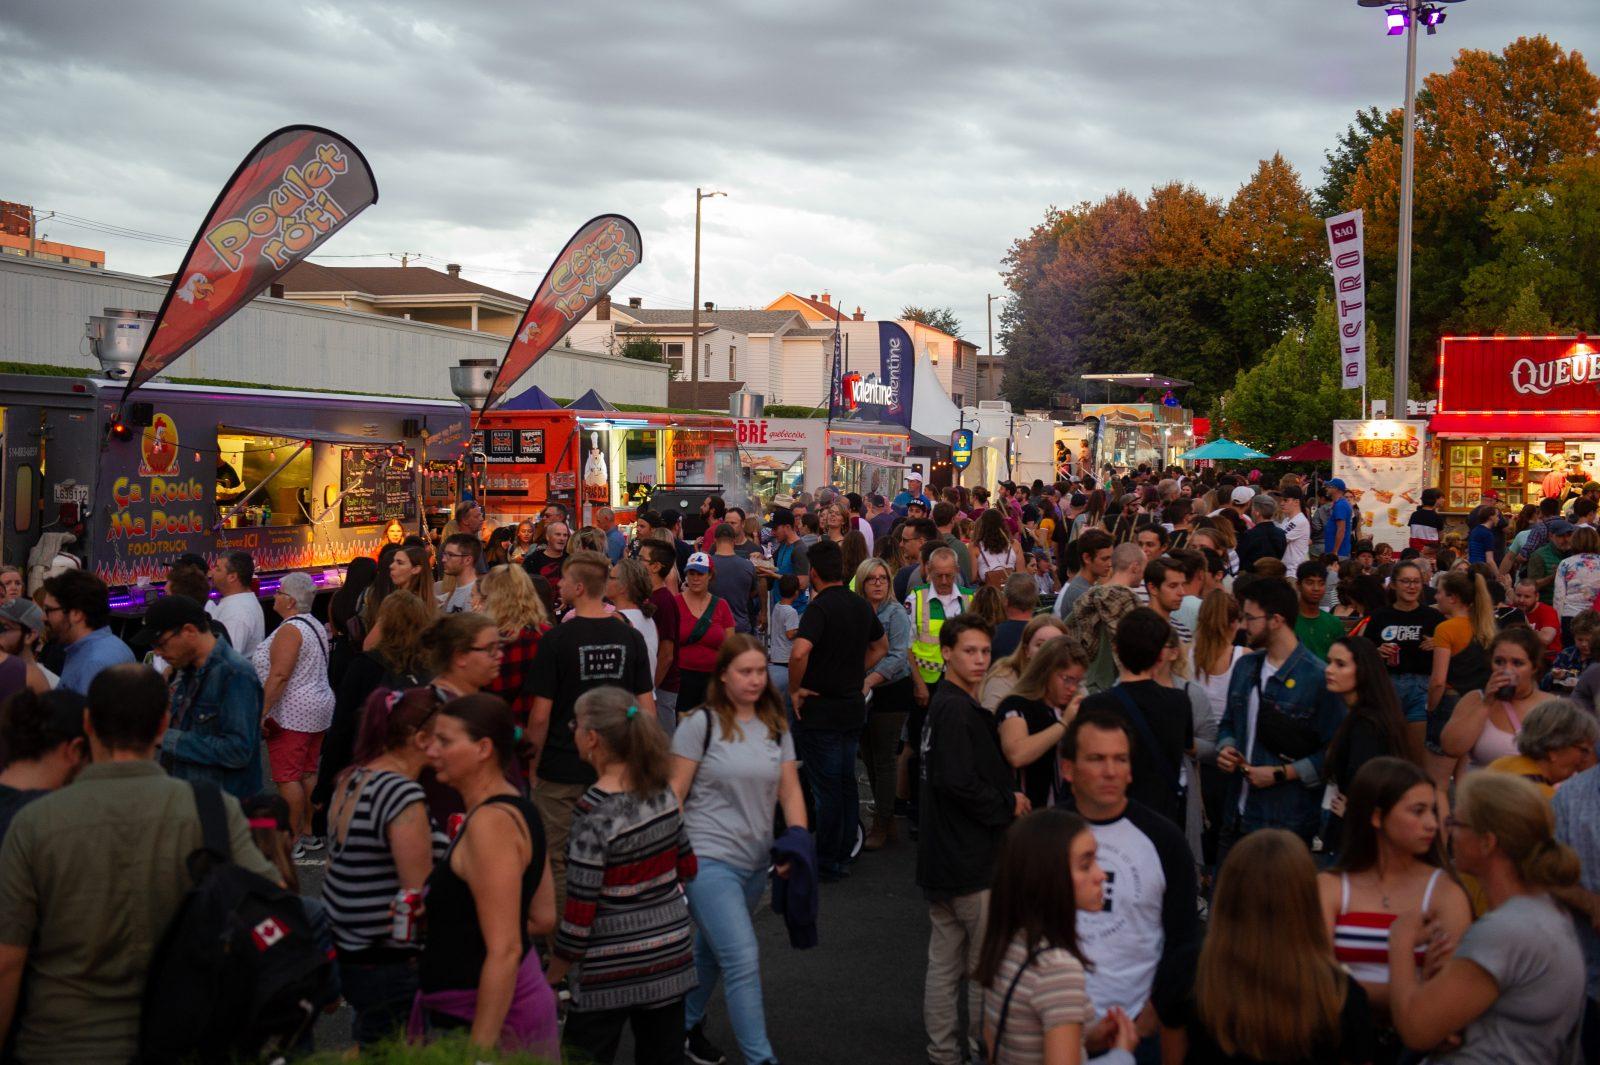 Québec permet les rassemblements publics extérieurs de 250 personnes